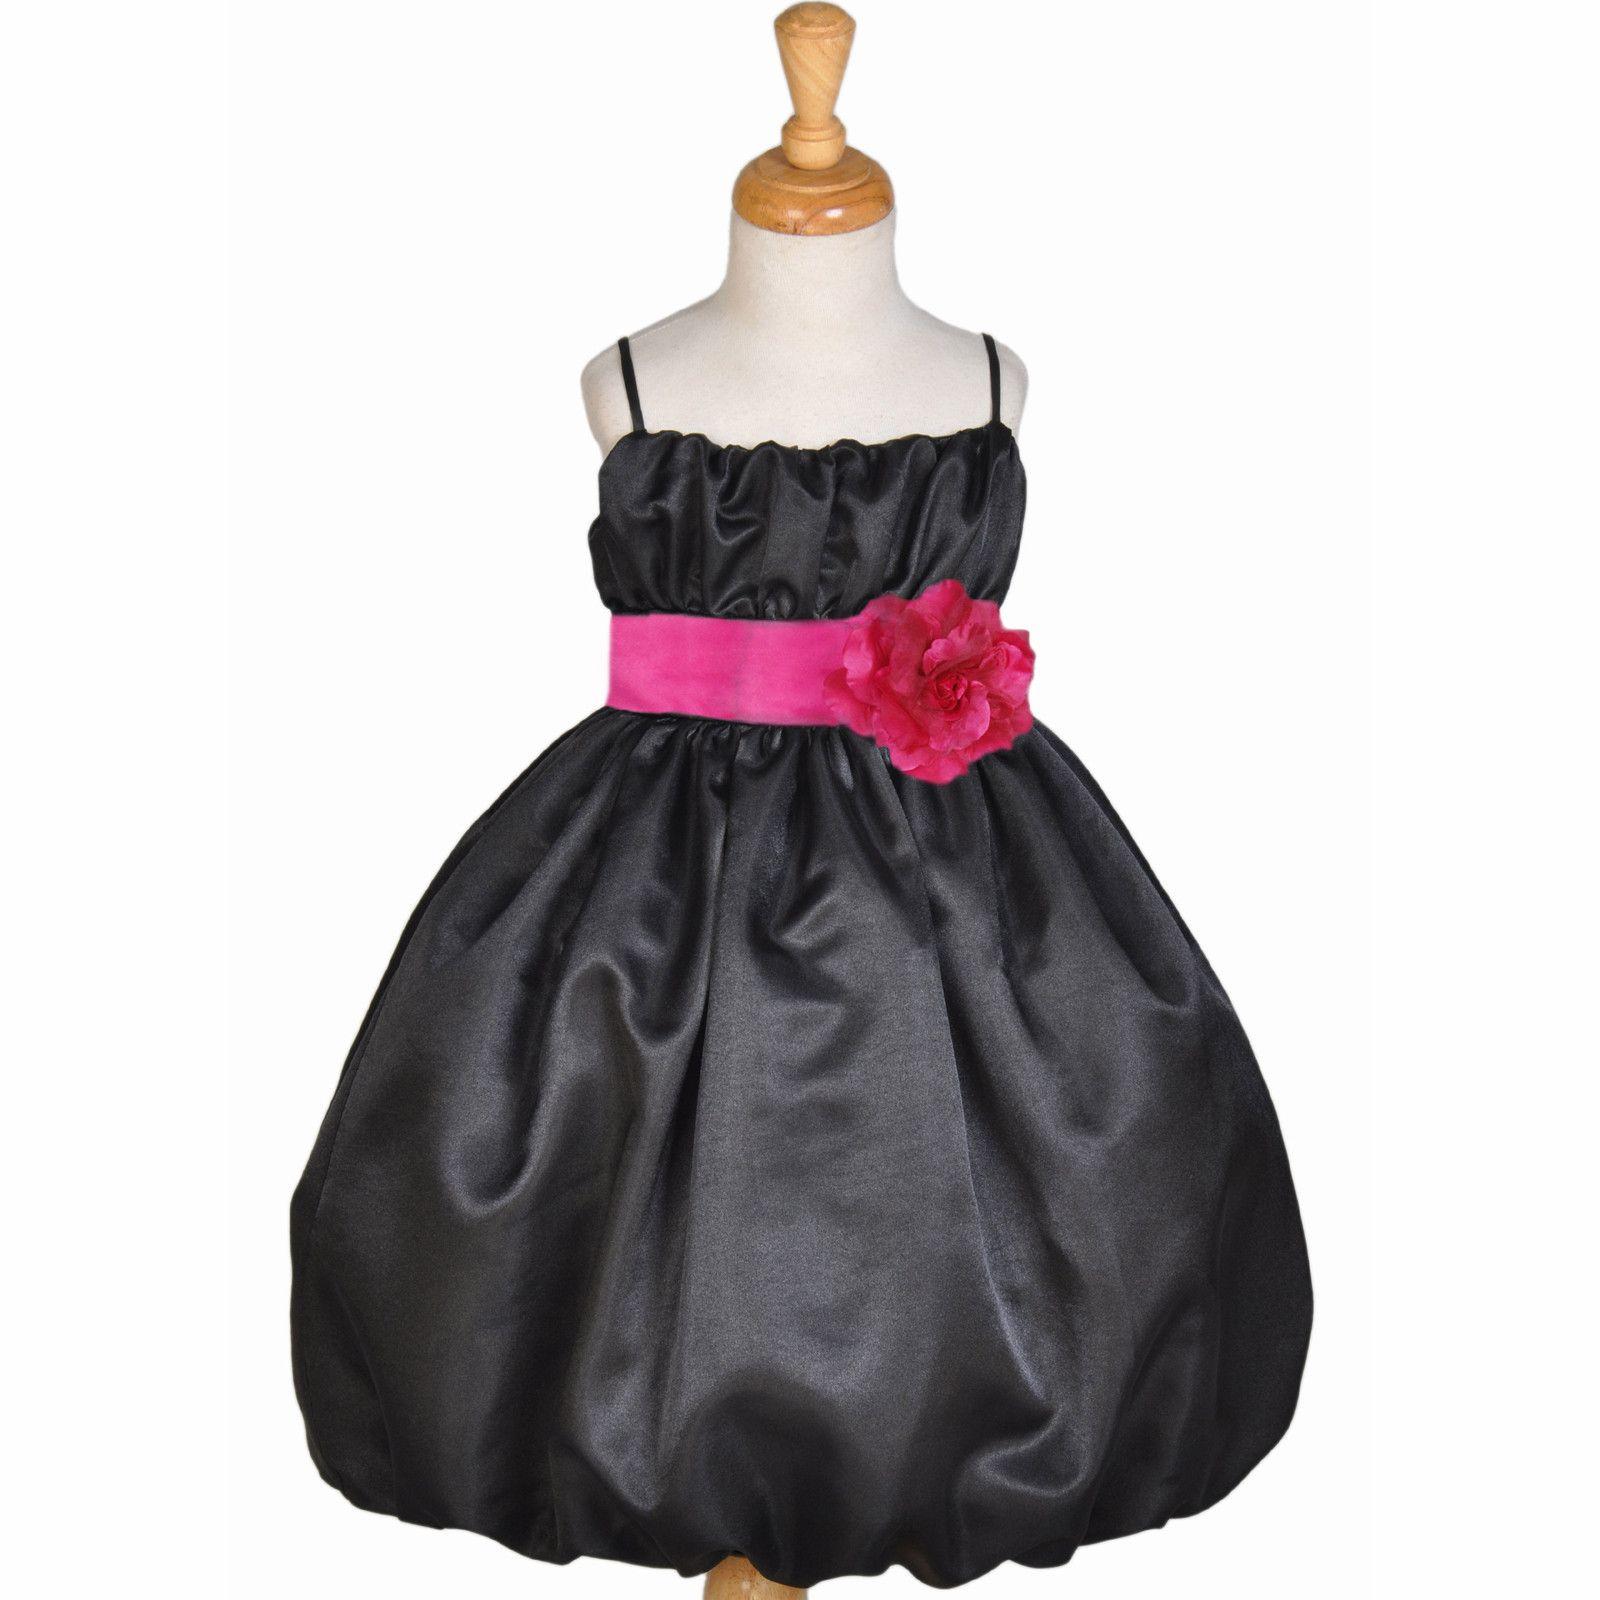 Black fuchsia pink holiday wedding pageant toddler flower girl dress